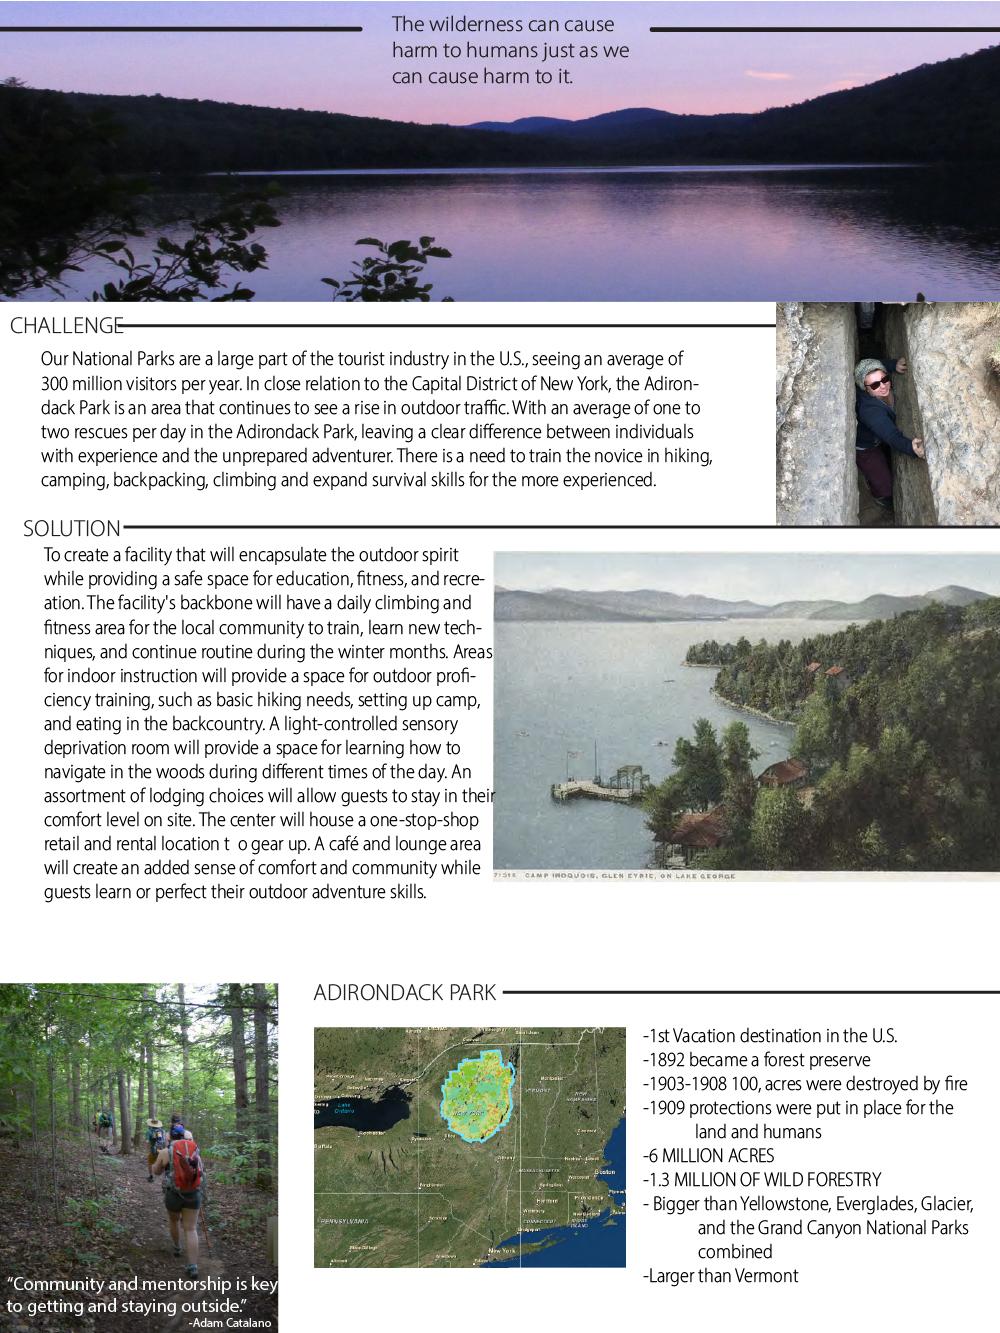 BlakelyHolly_Adirondack-Basecamp-pg-2